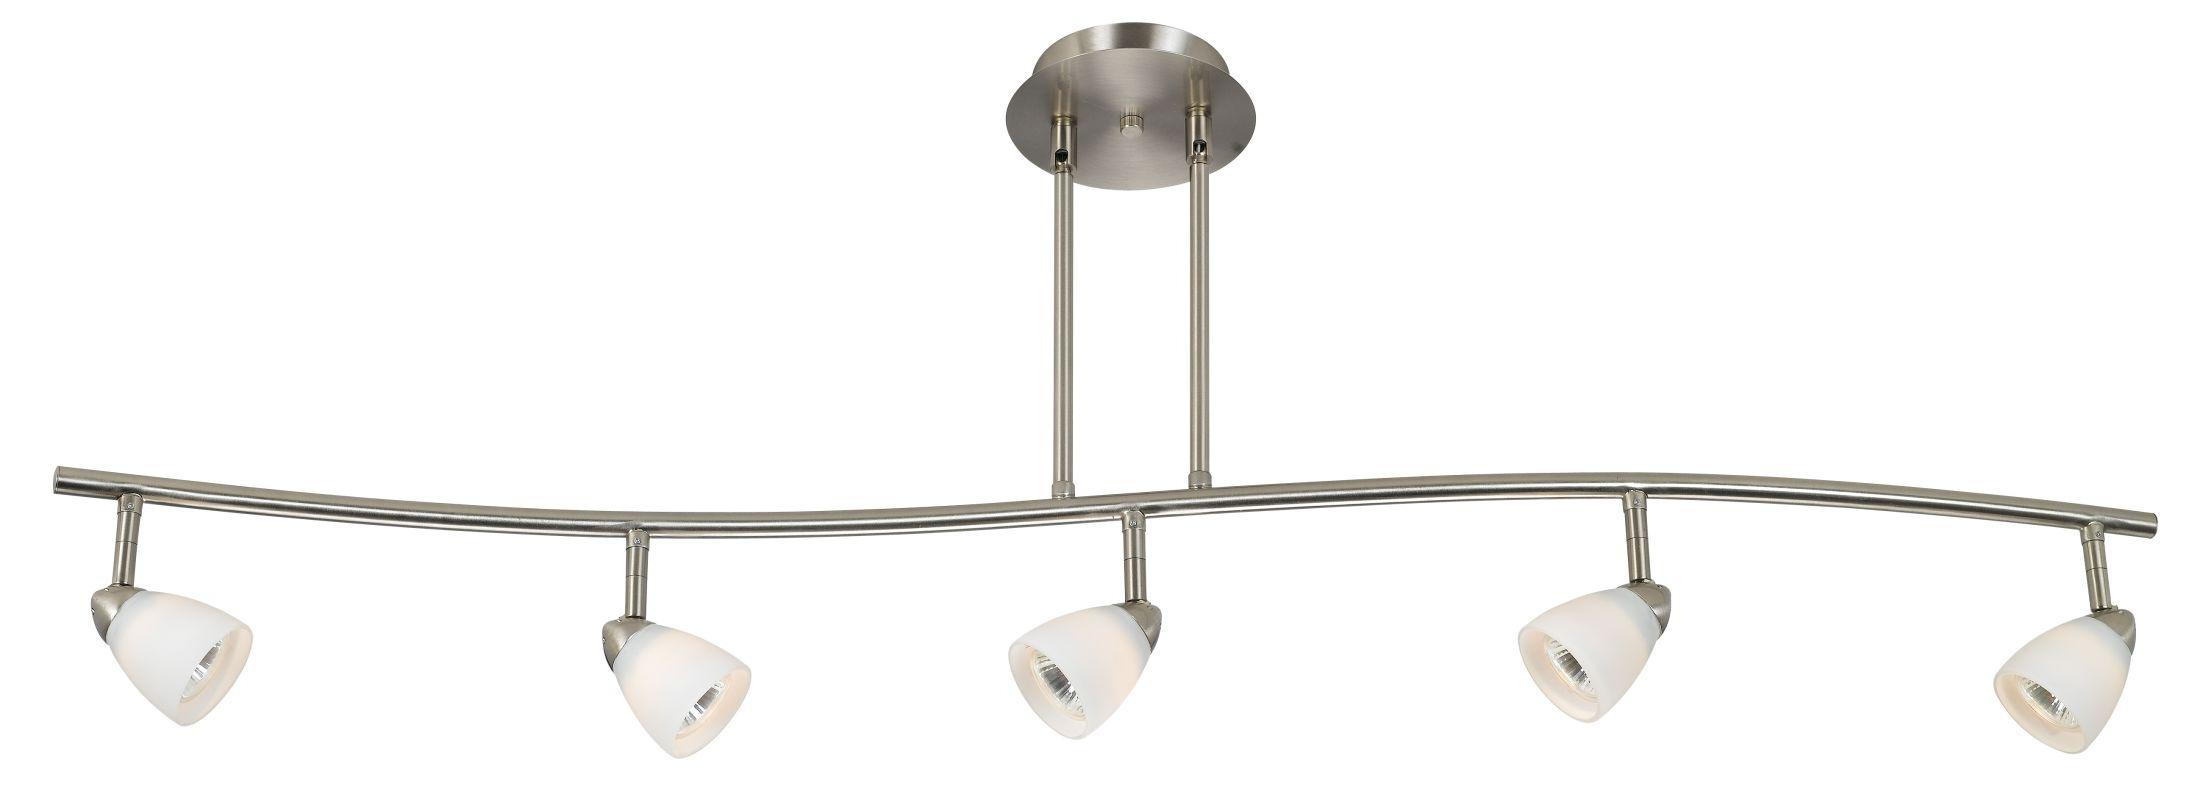 Cal lighting sl 954 5 bs wh brushed steel 5 light canopy for Orbit michael metal floor lamp brushed steel